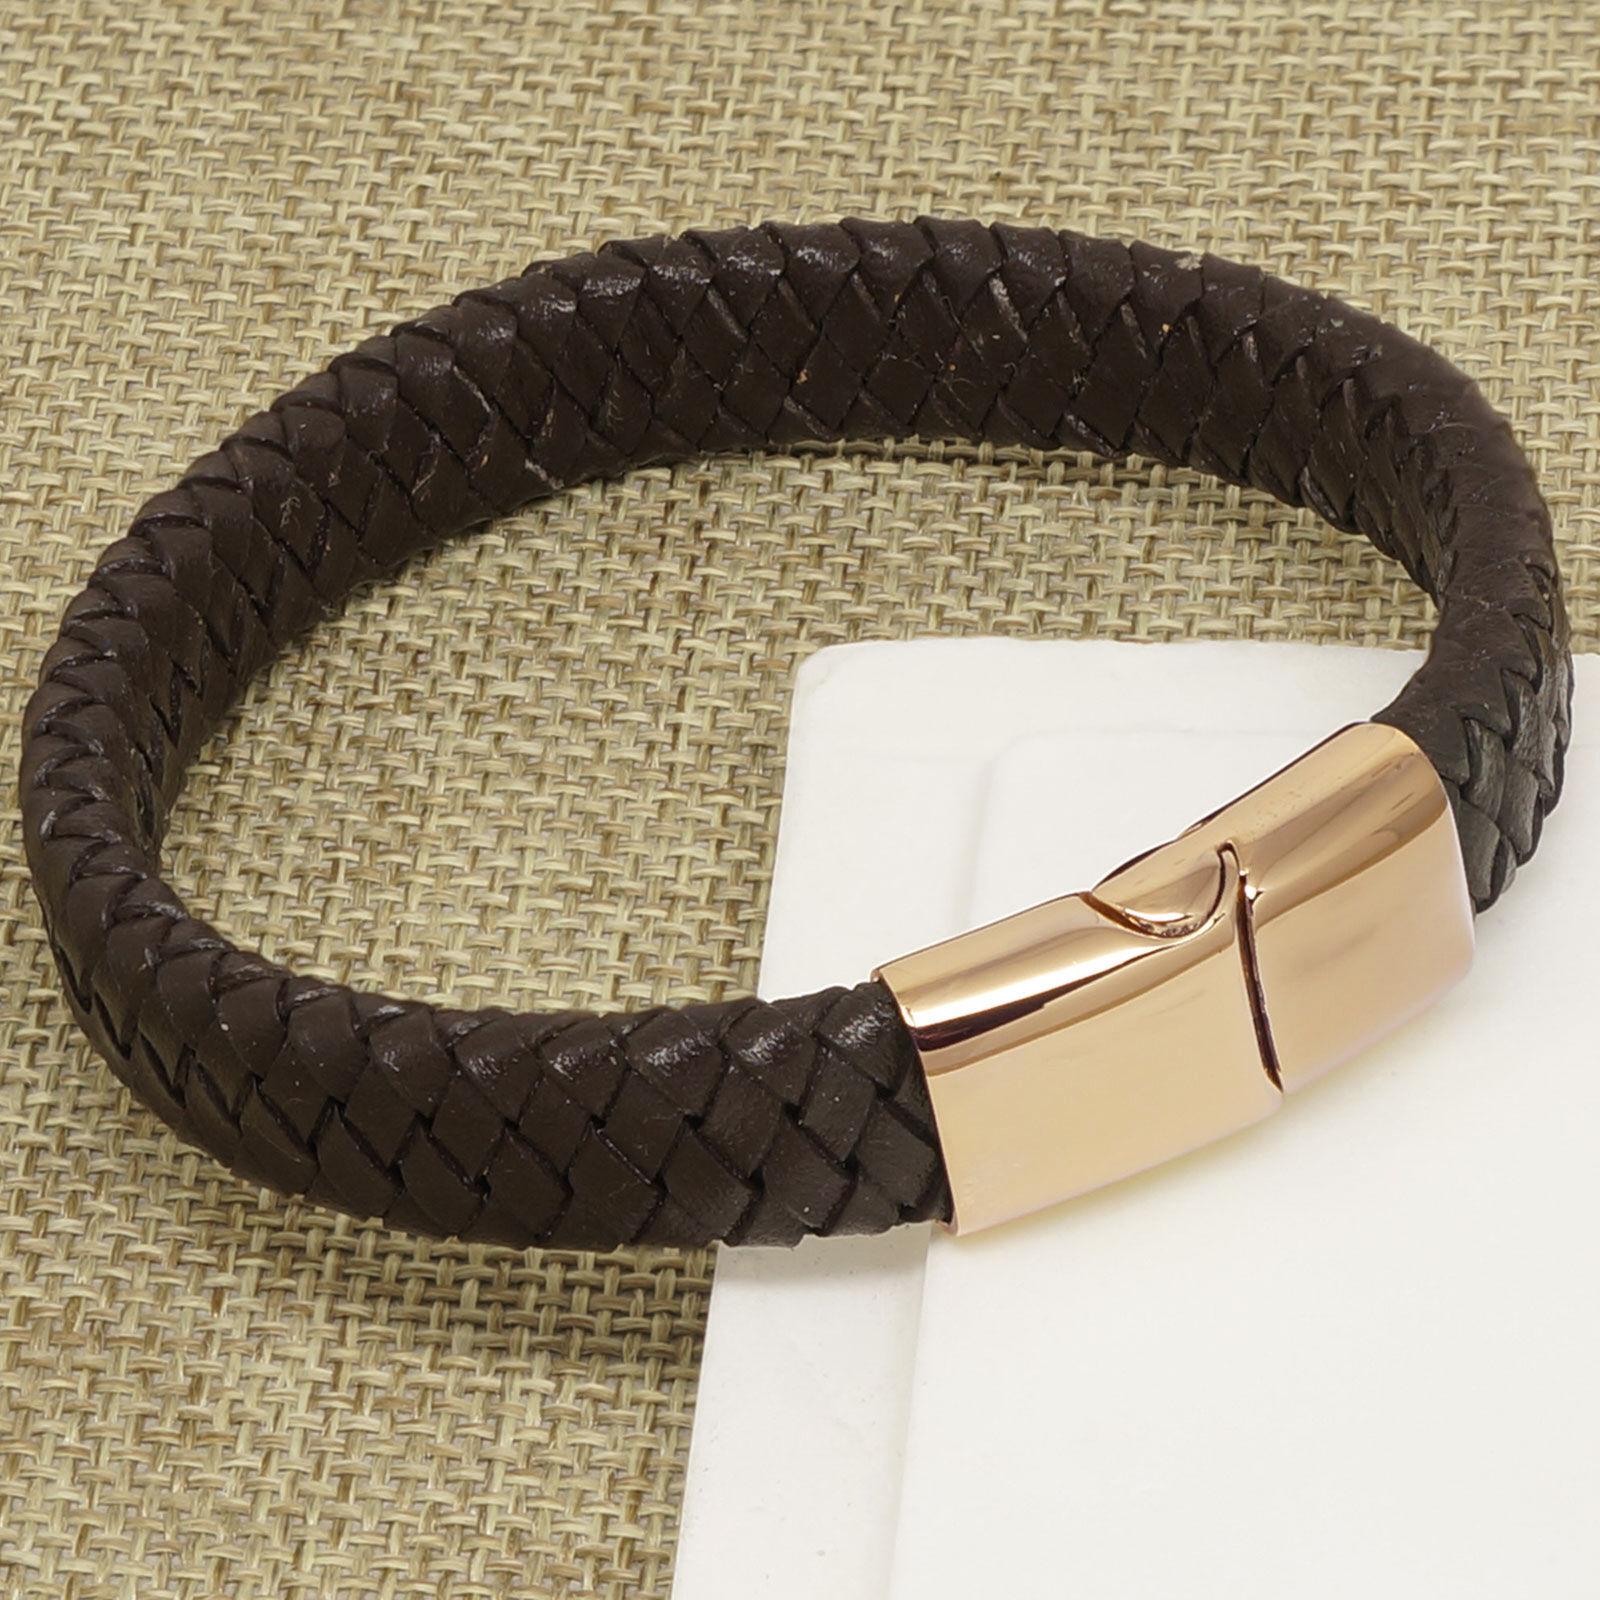 1 Unisex Lederband Armband Wickelarmband Braun Armkette Modeschmuck 98.5cm